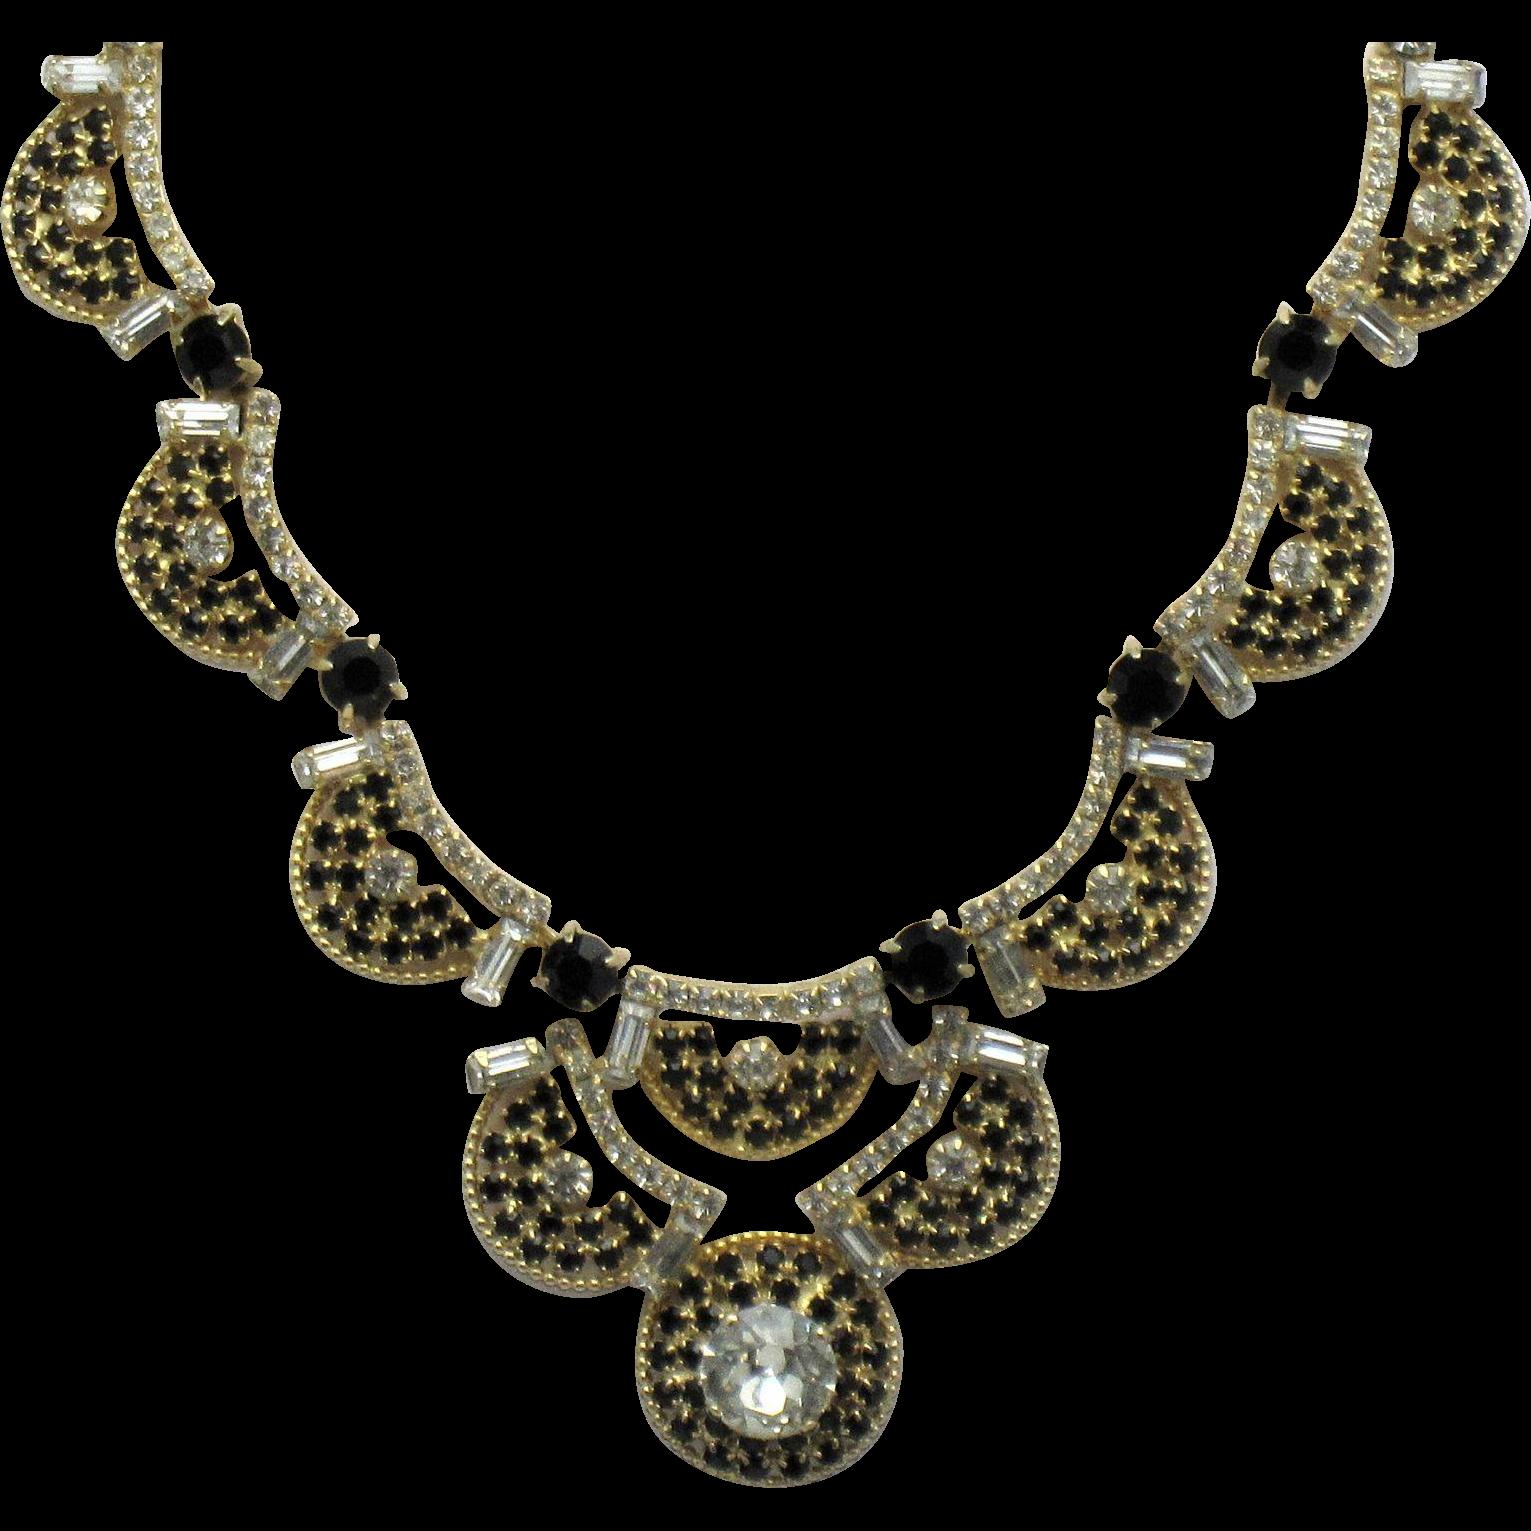 royalty free download Classy HOBE Black Clear Rhinestone Choker Necklace